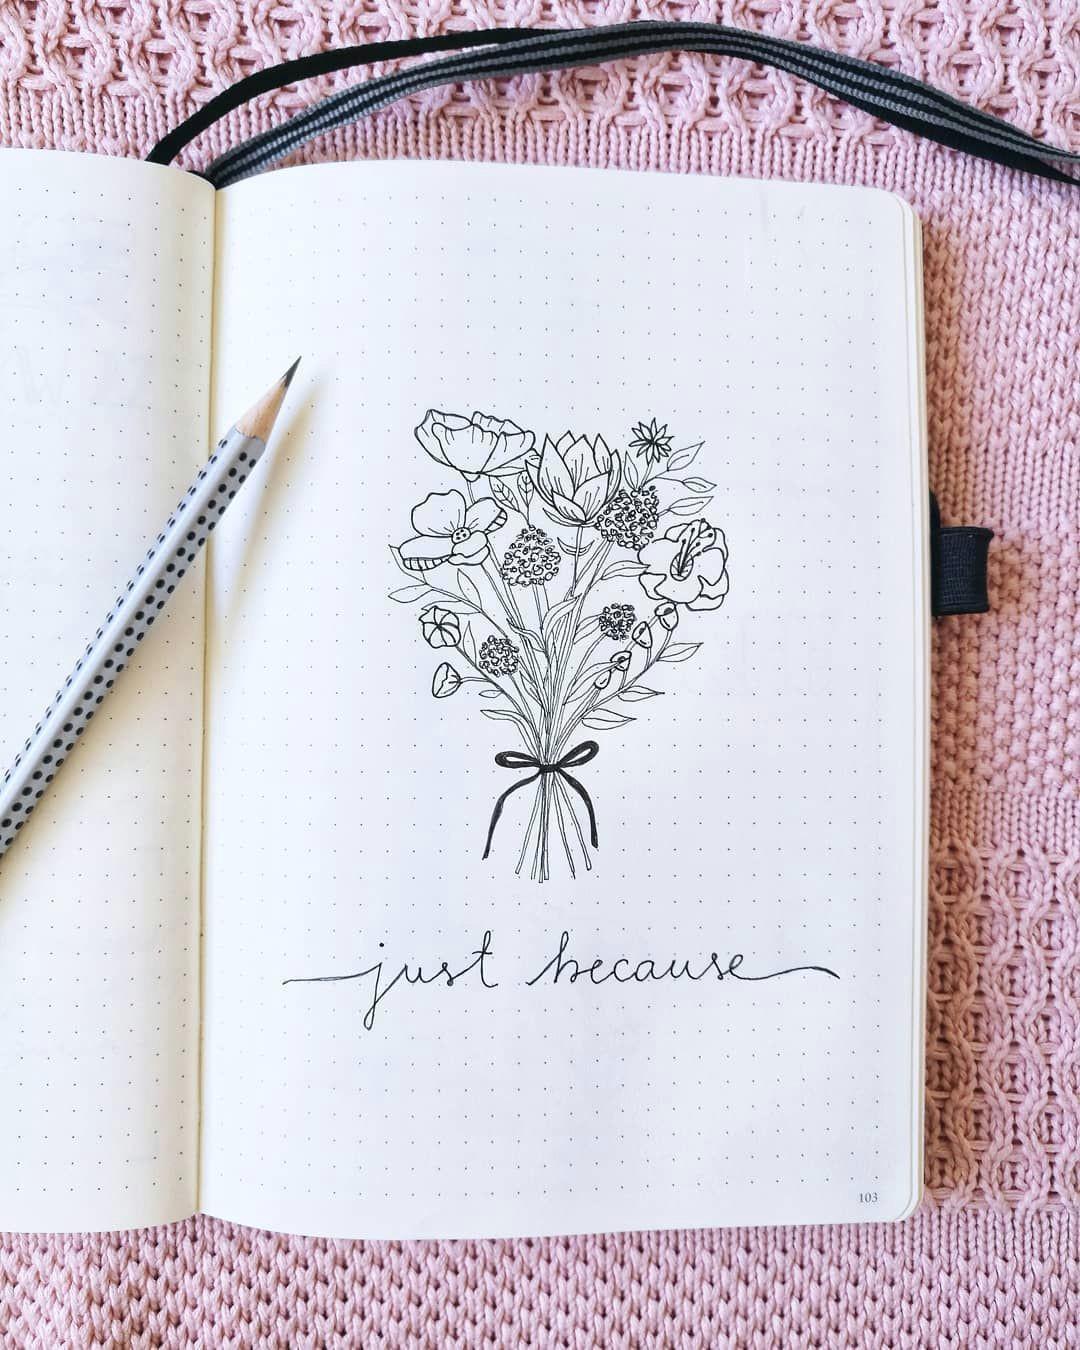 Bullet Journal Drawing Ideas Bullet Journal Drawing Idea Flower Bouquet Drawing